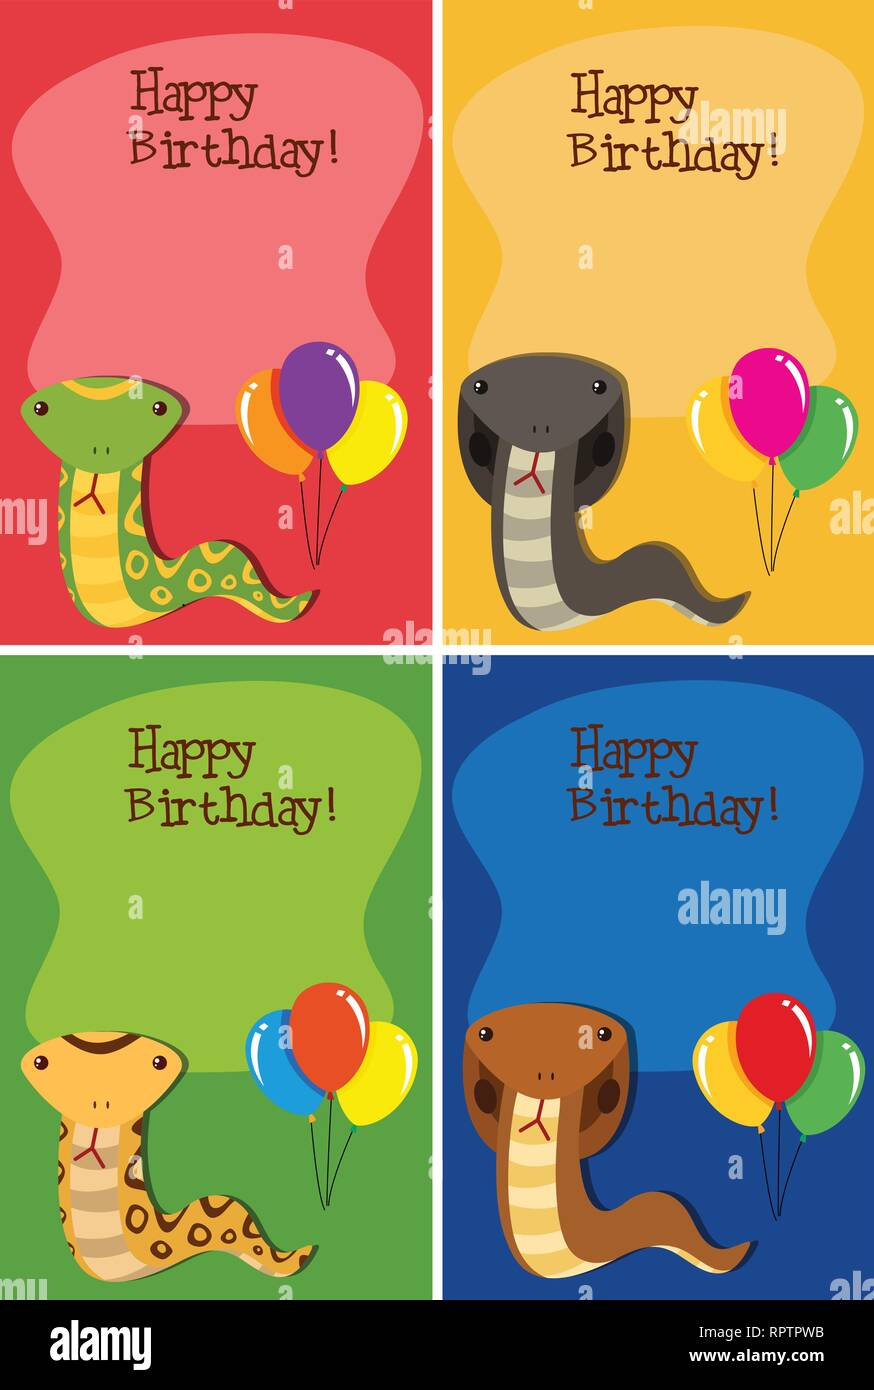 Satz von Snake Happy Birthday Cards Abbildung Stock Vektorgrafik ...